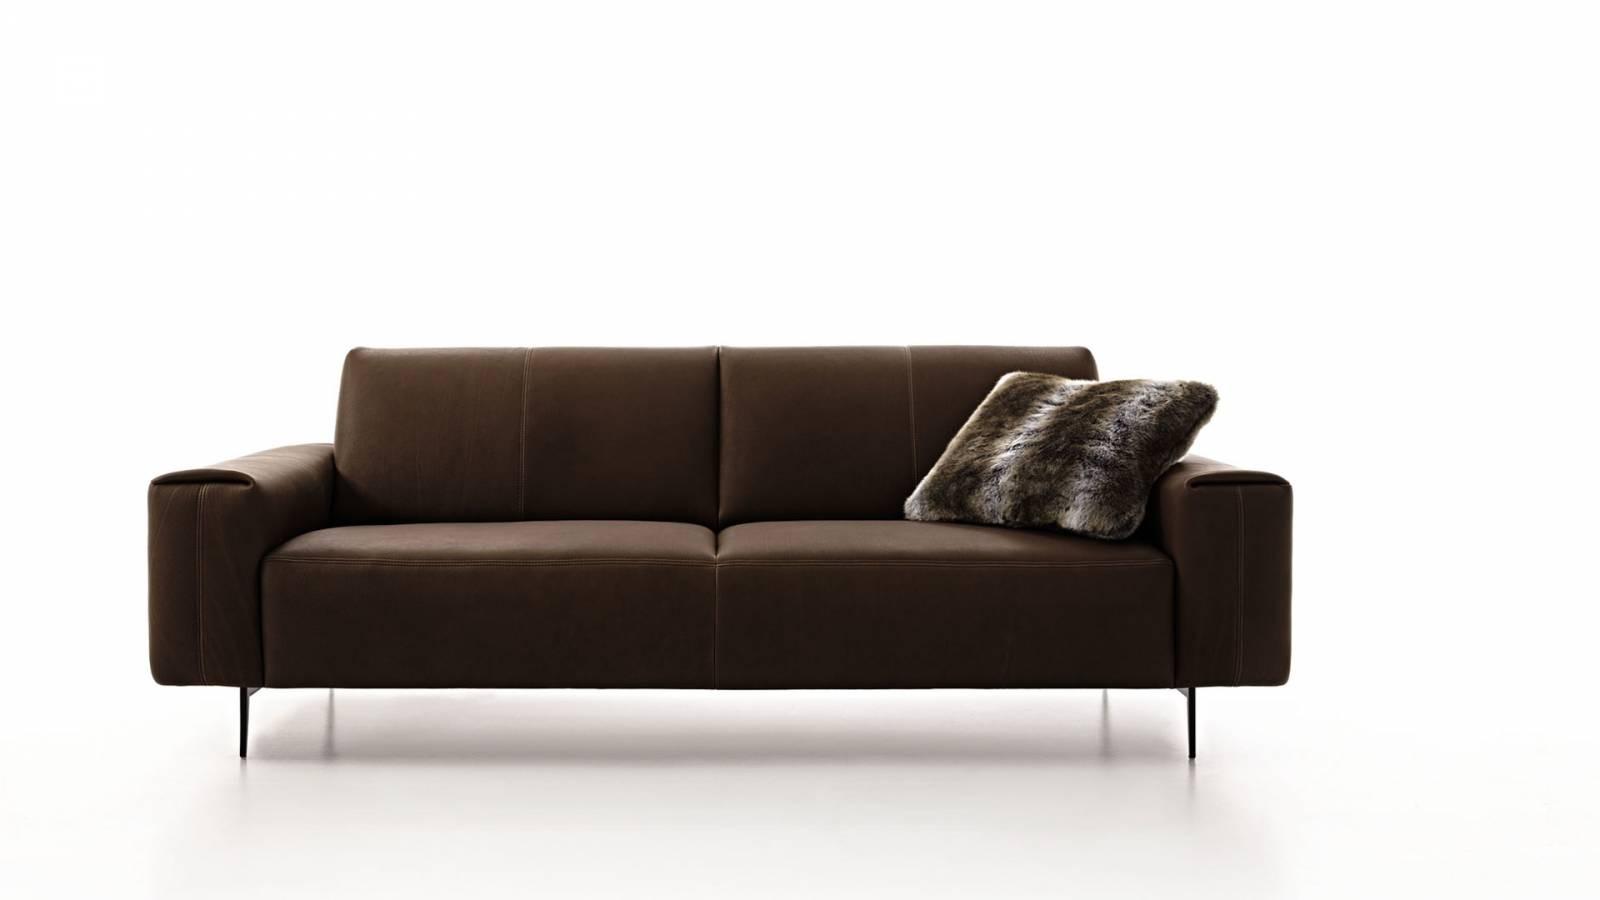 Canapea modernă Koinor Newman